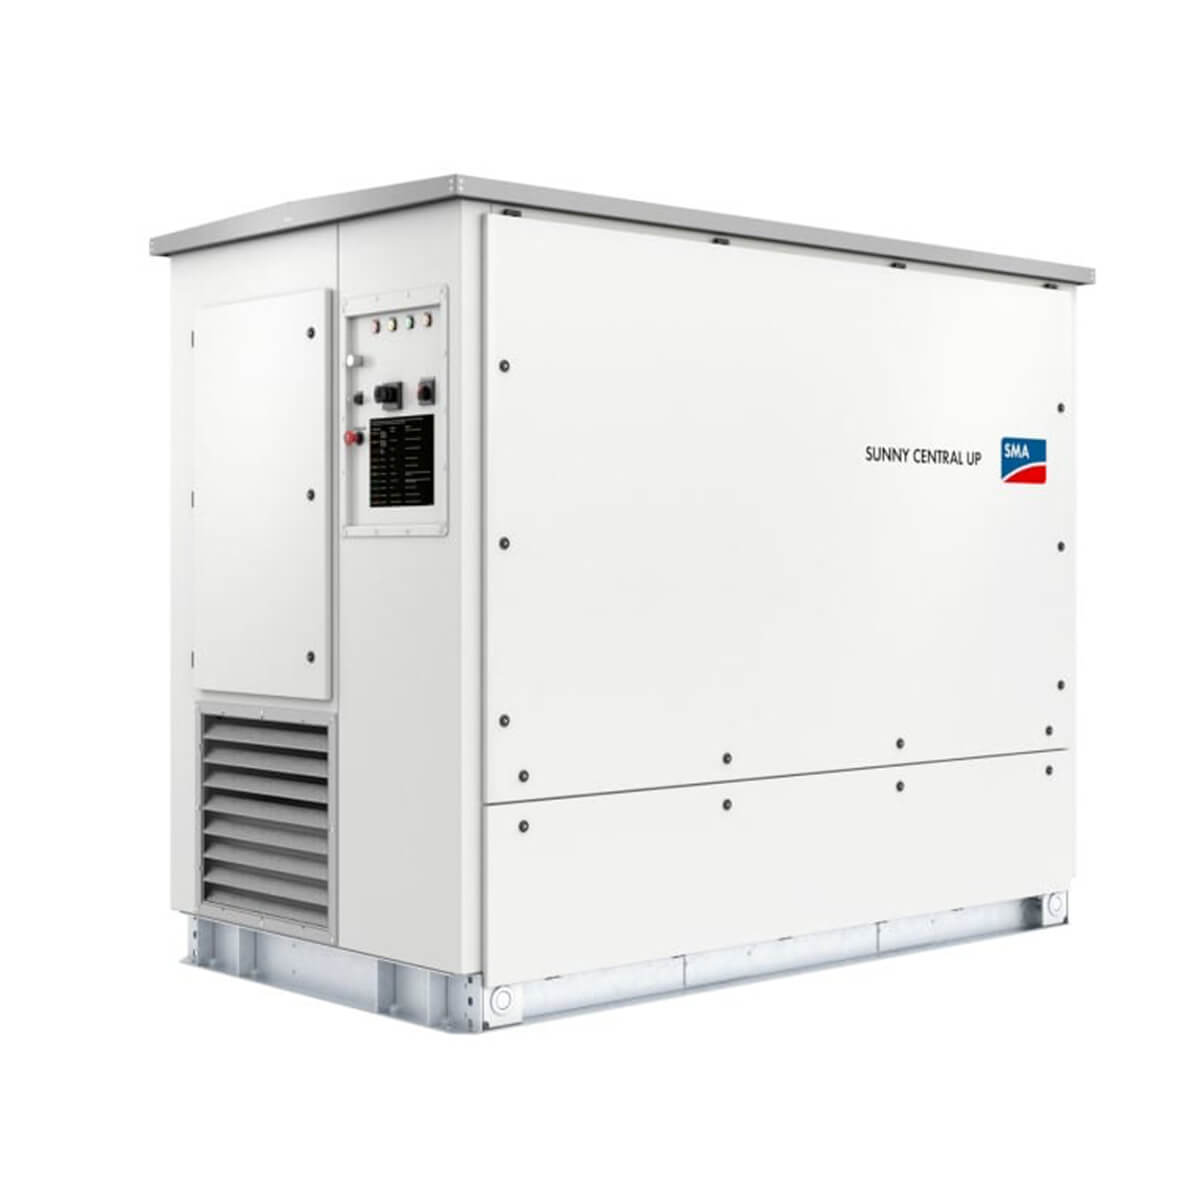 sma 4200kW inverter, sma sunny central 4200kW inverter, sma sunny central 4200 up inverter, sma sunny central 4200 up, sma sunny central 4200 kW, SMA 4200KW